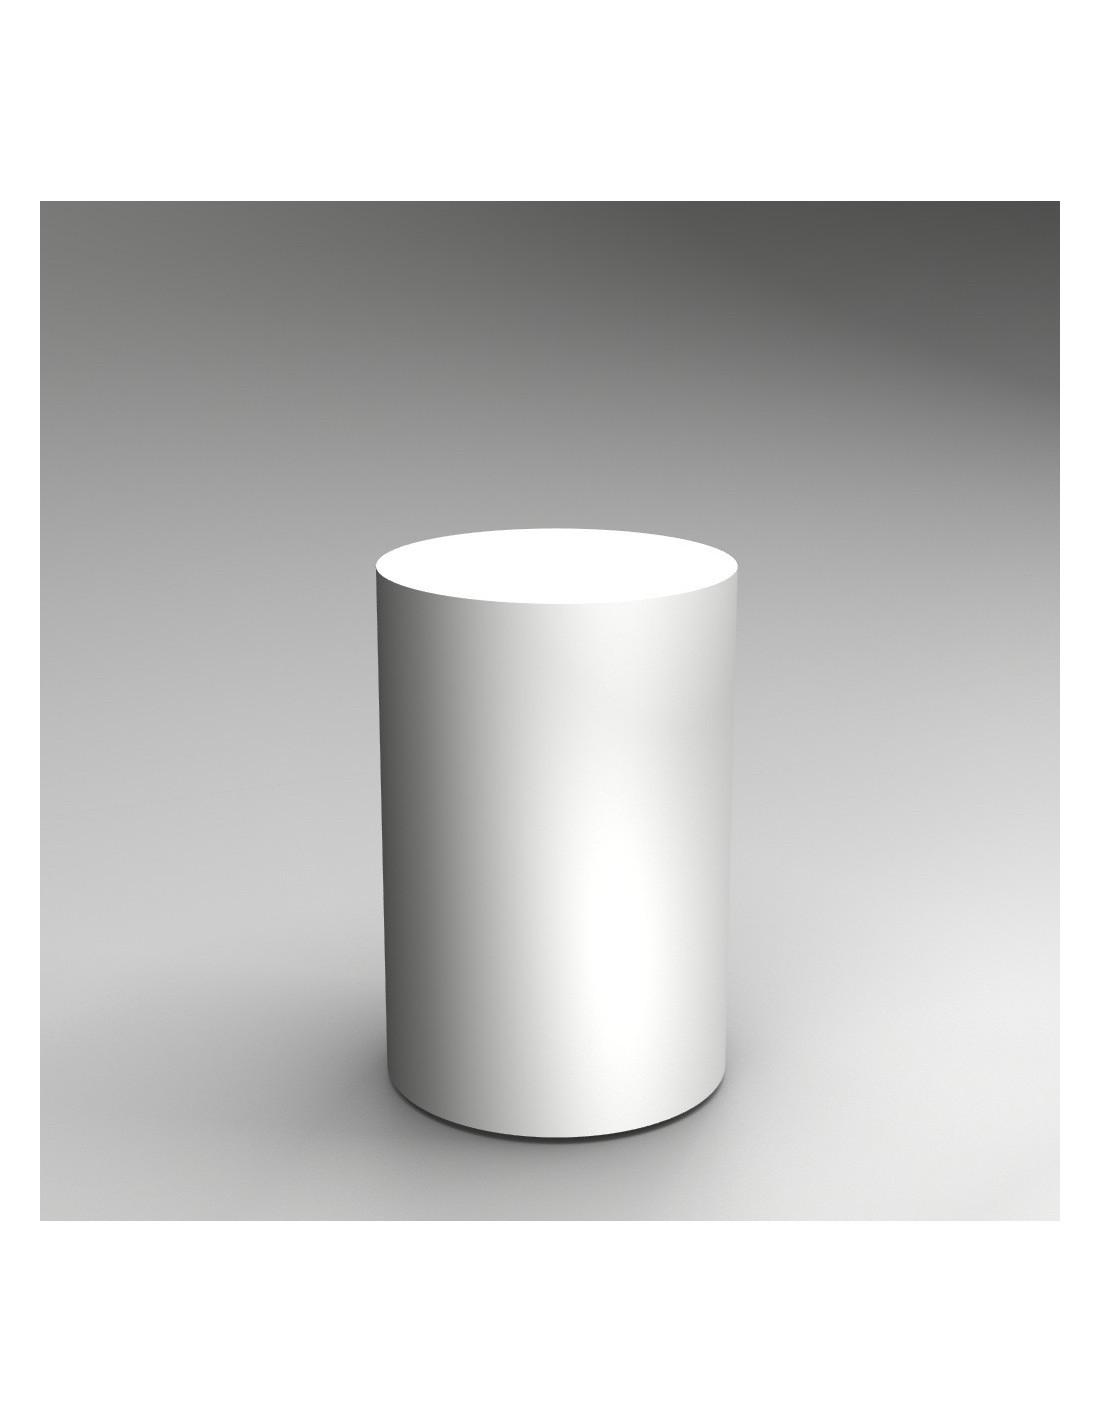 Artplinths 90h X 60d Cm Diameter Or Round Cylinder Plinth